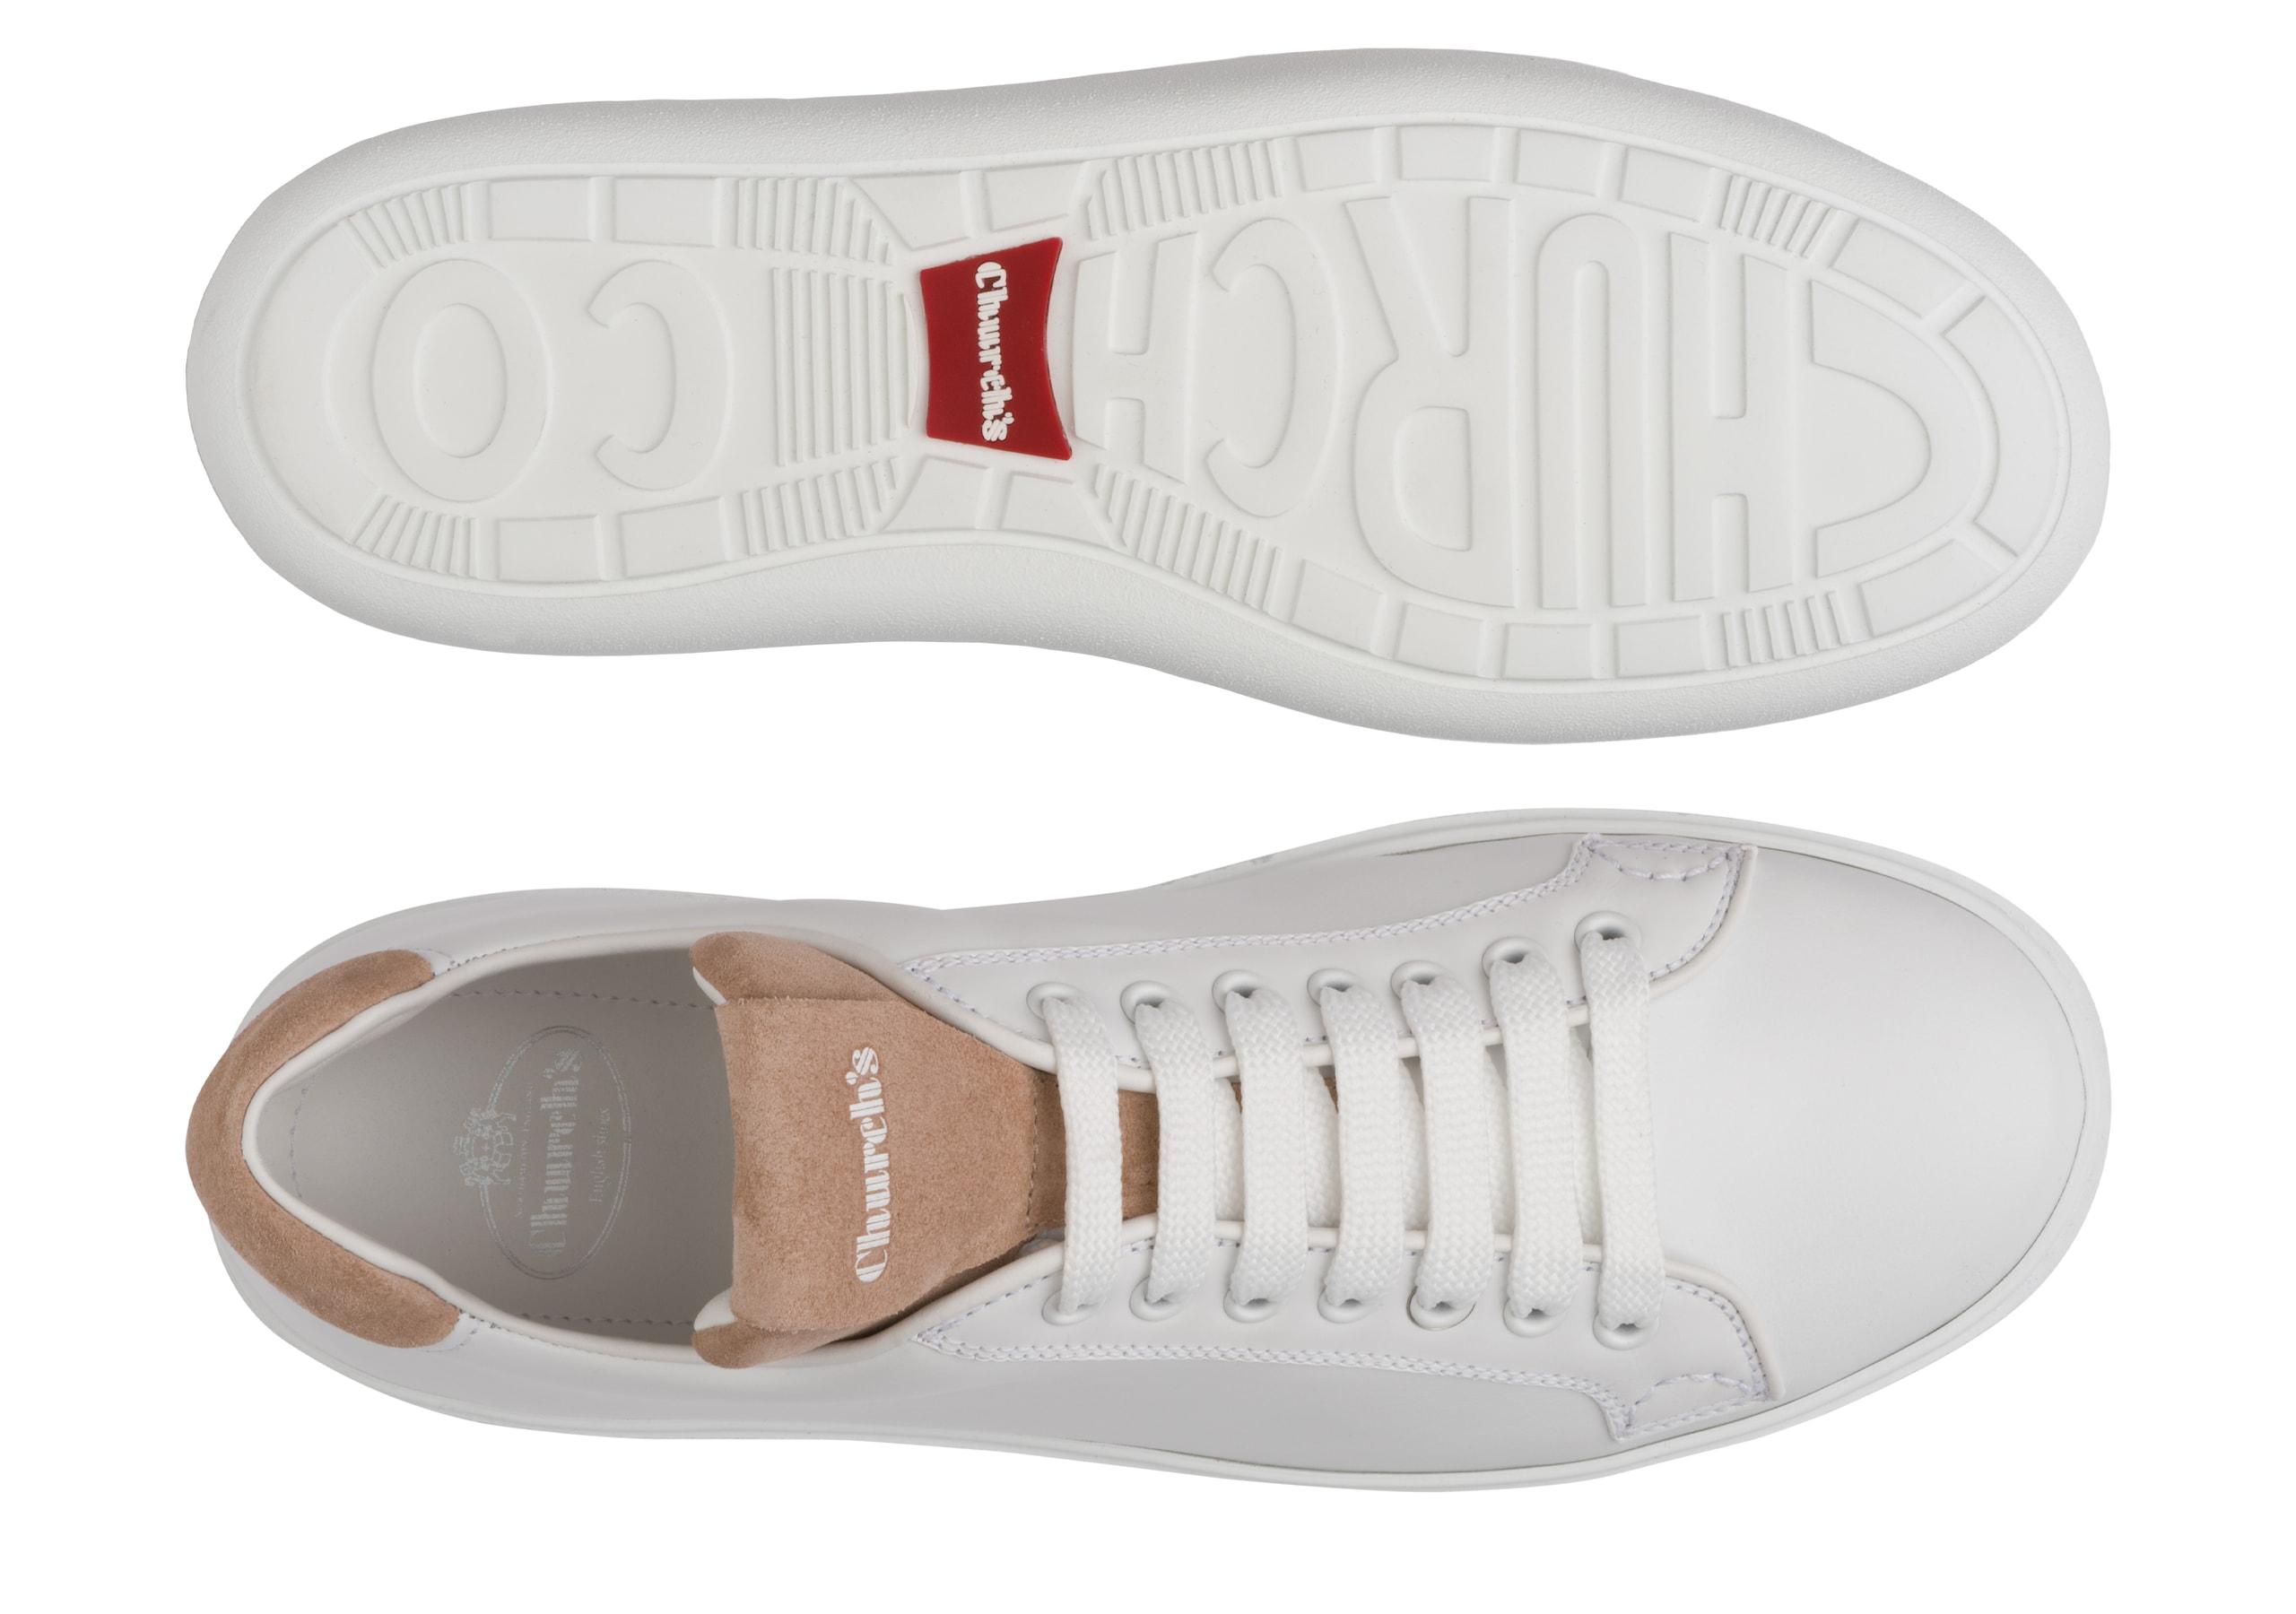 Boland w Church's Calf Leather Classic Sneaker White